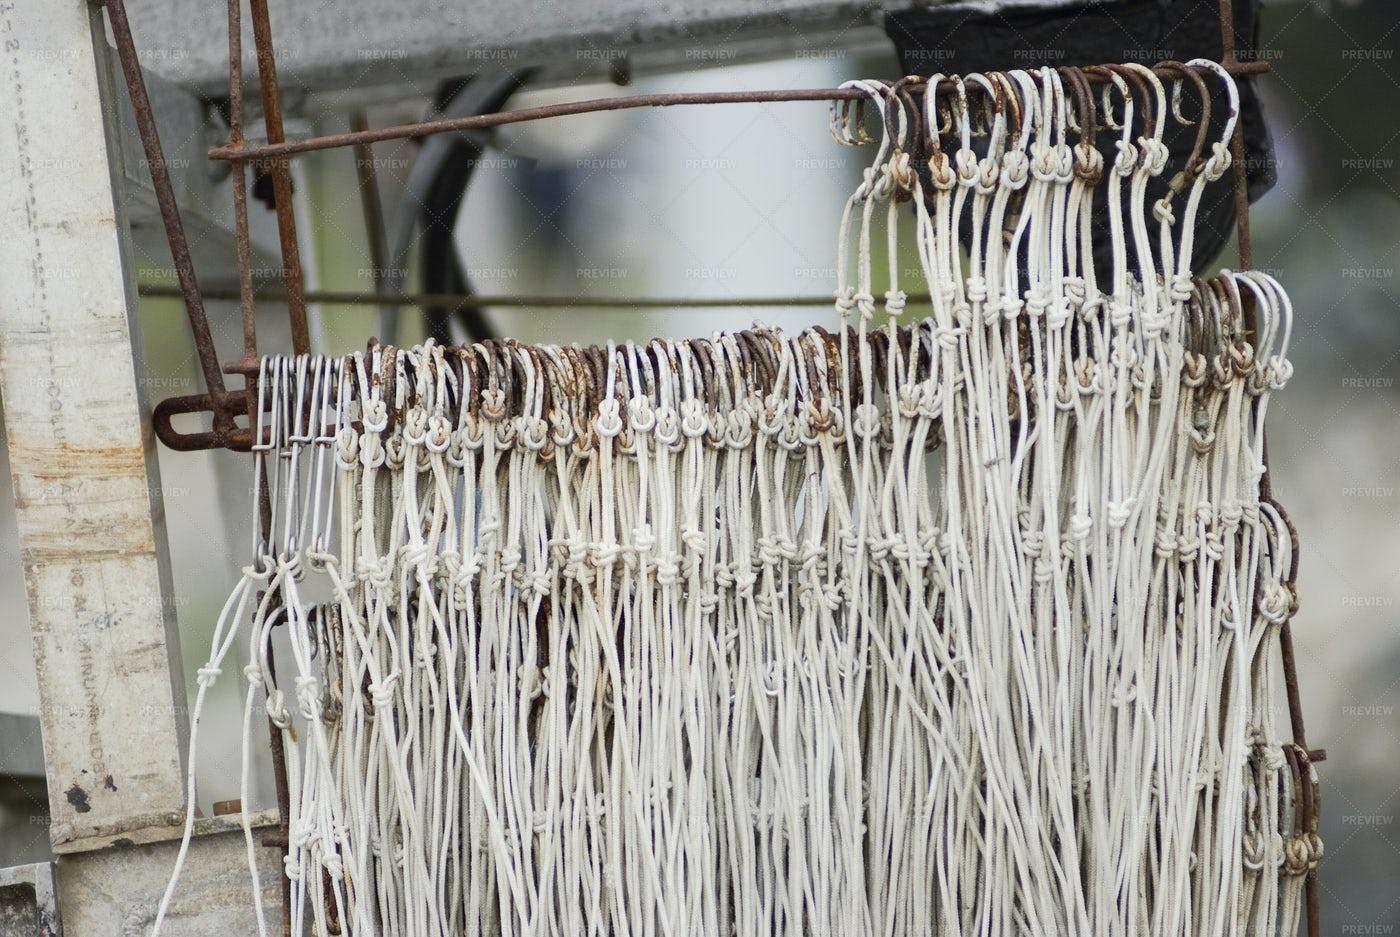 Rusty Fishing Hooks: Stock Photos